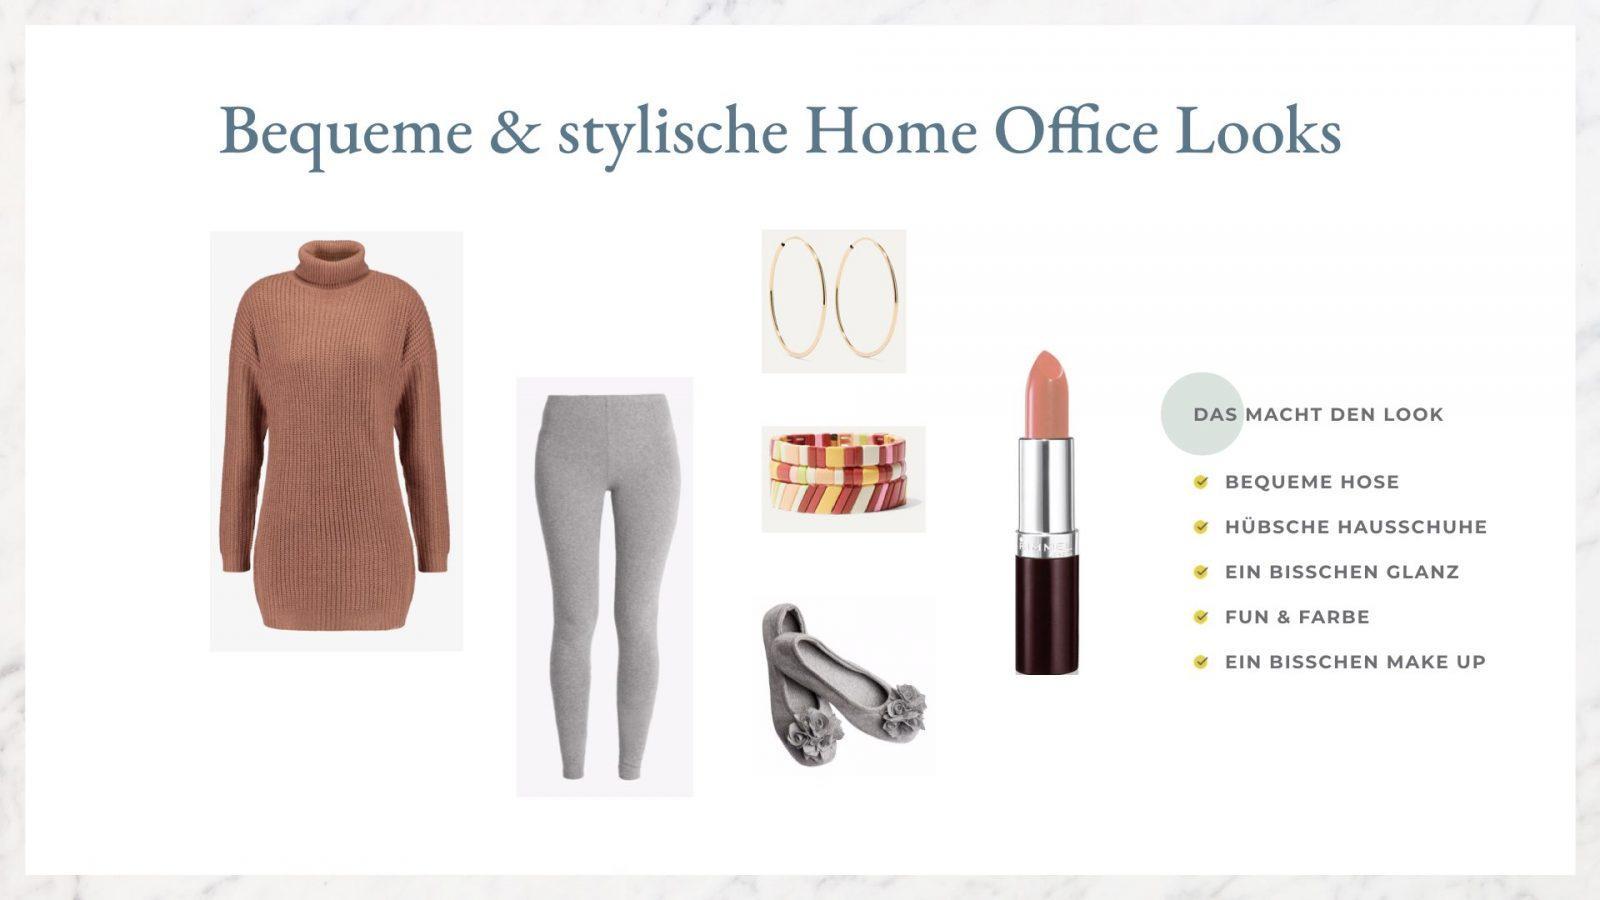 Home Office was anziehen